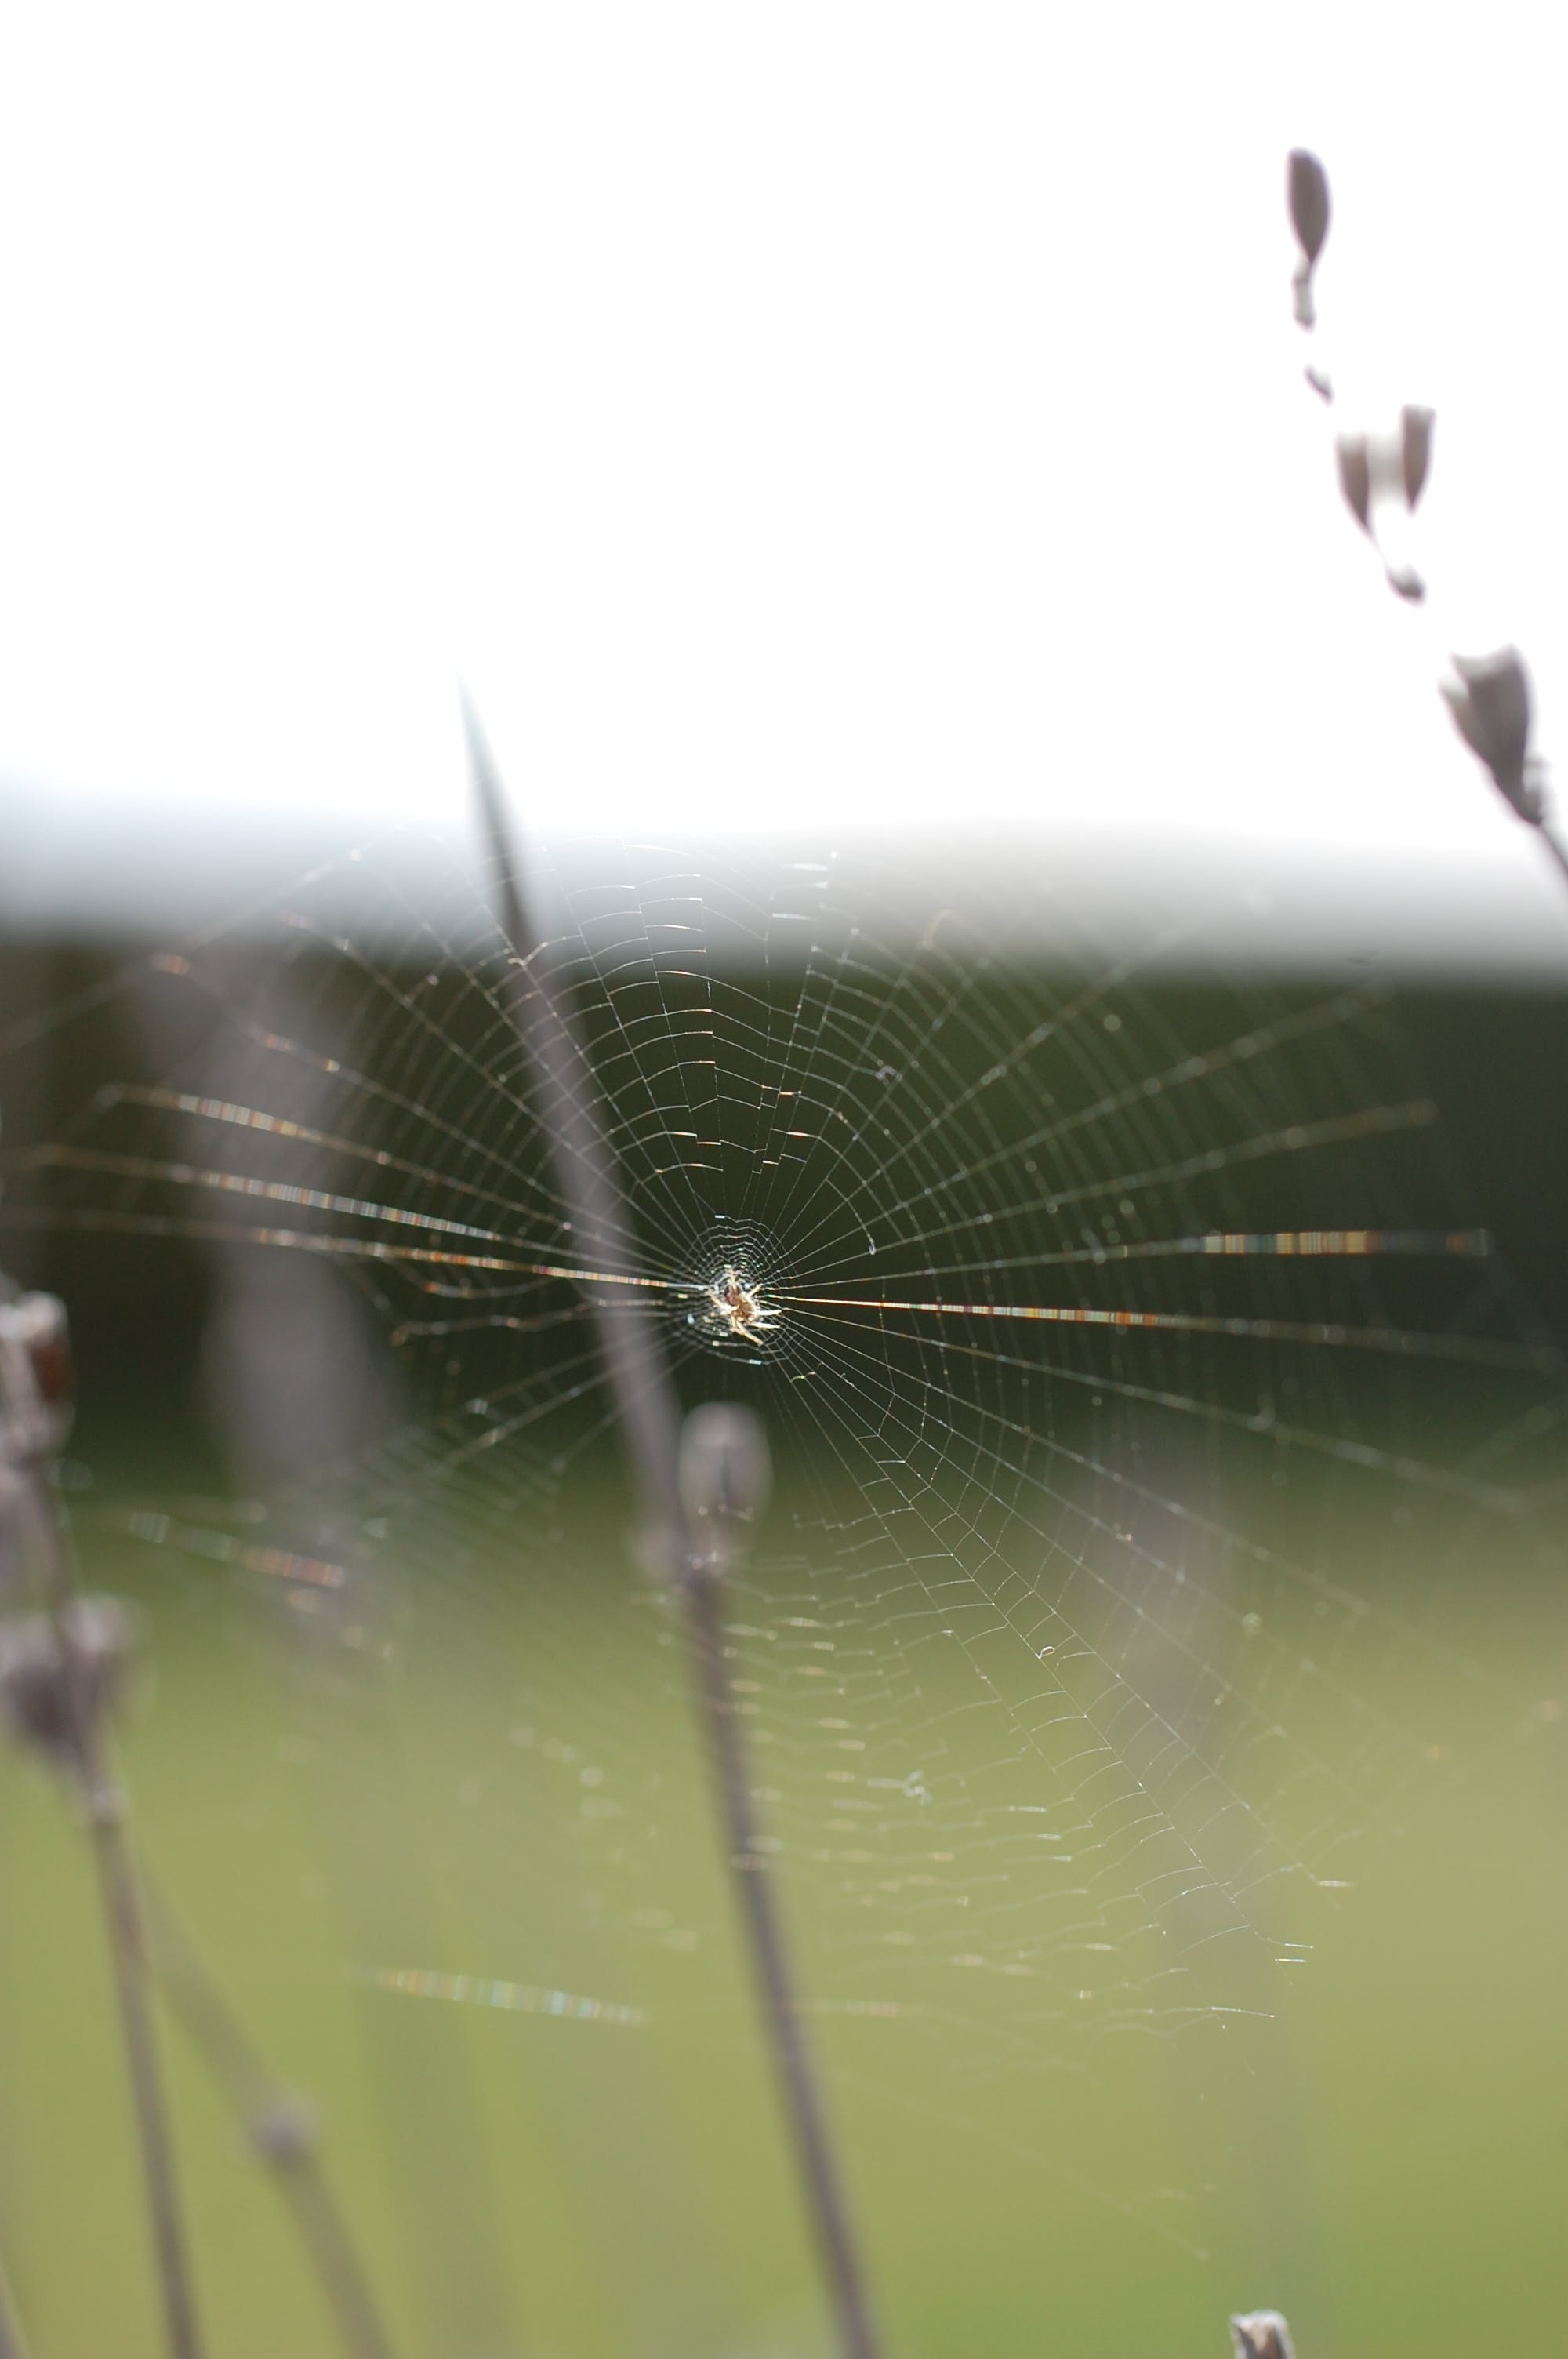 Free stock photo of blur, close up, macro, nature